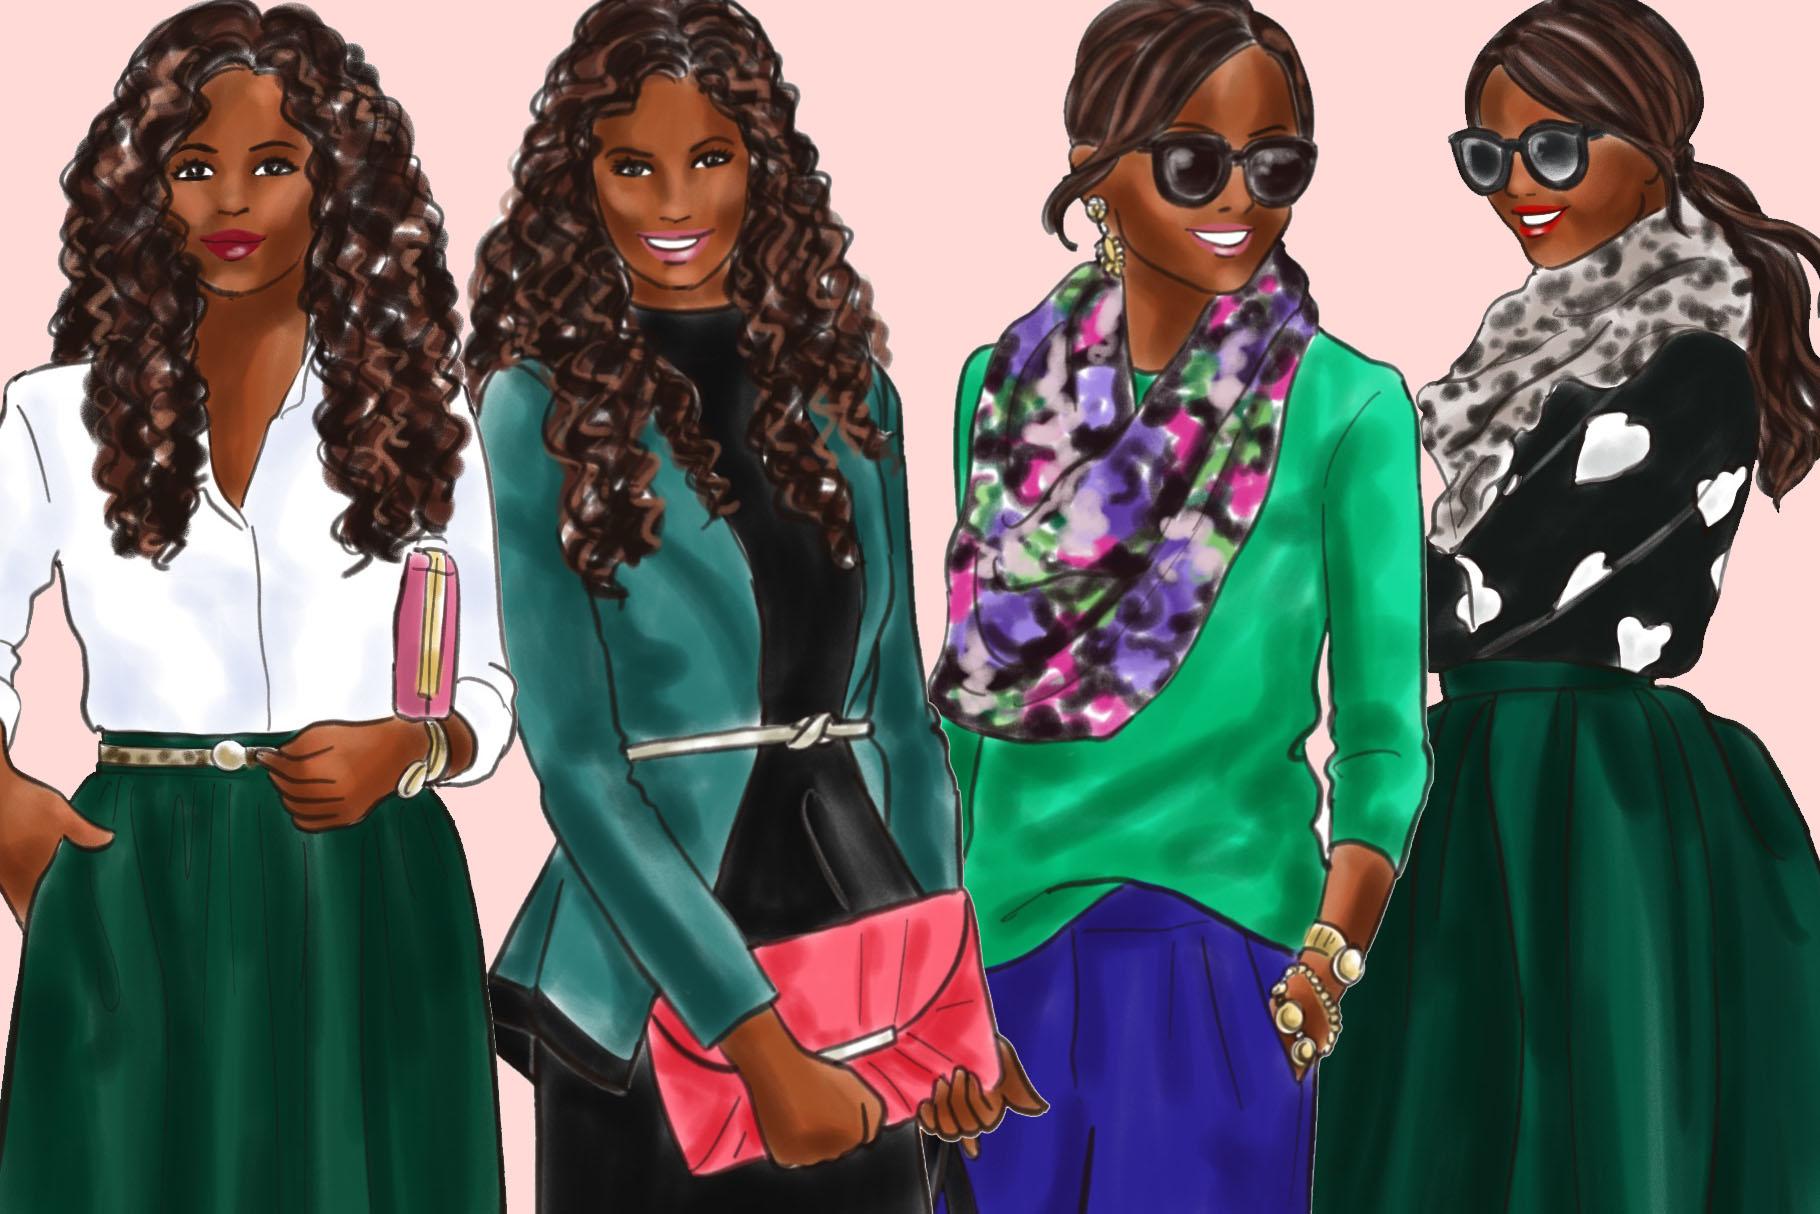 Fashion illustration clipart - Girls in Green 2 - Dark Skin example image 3